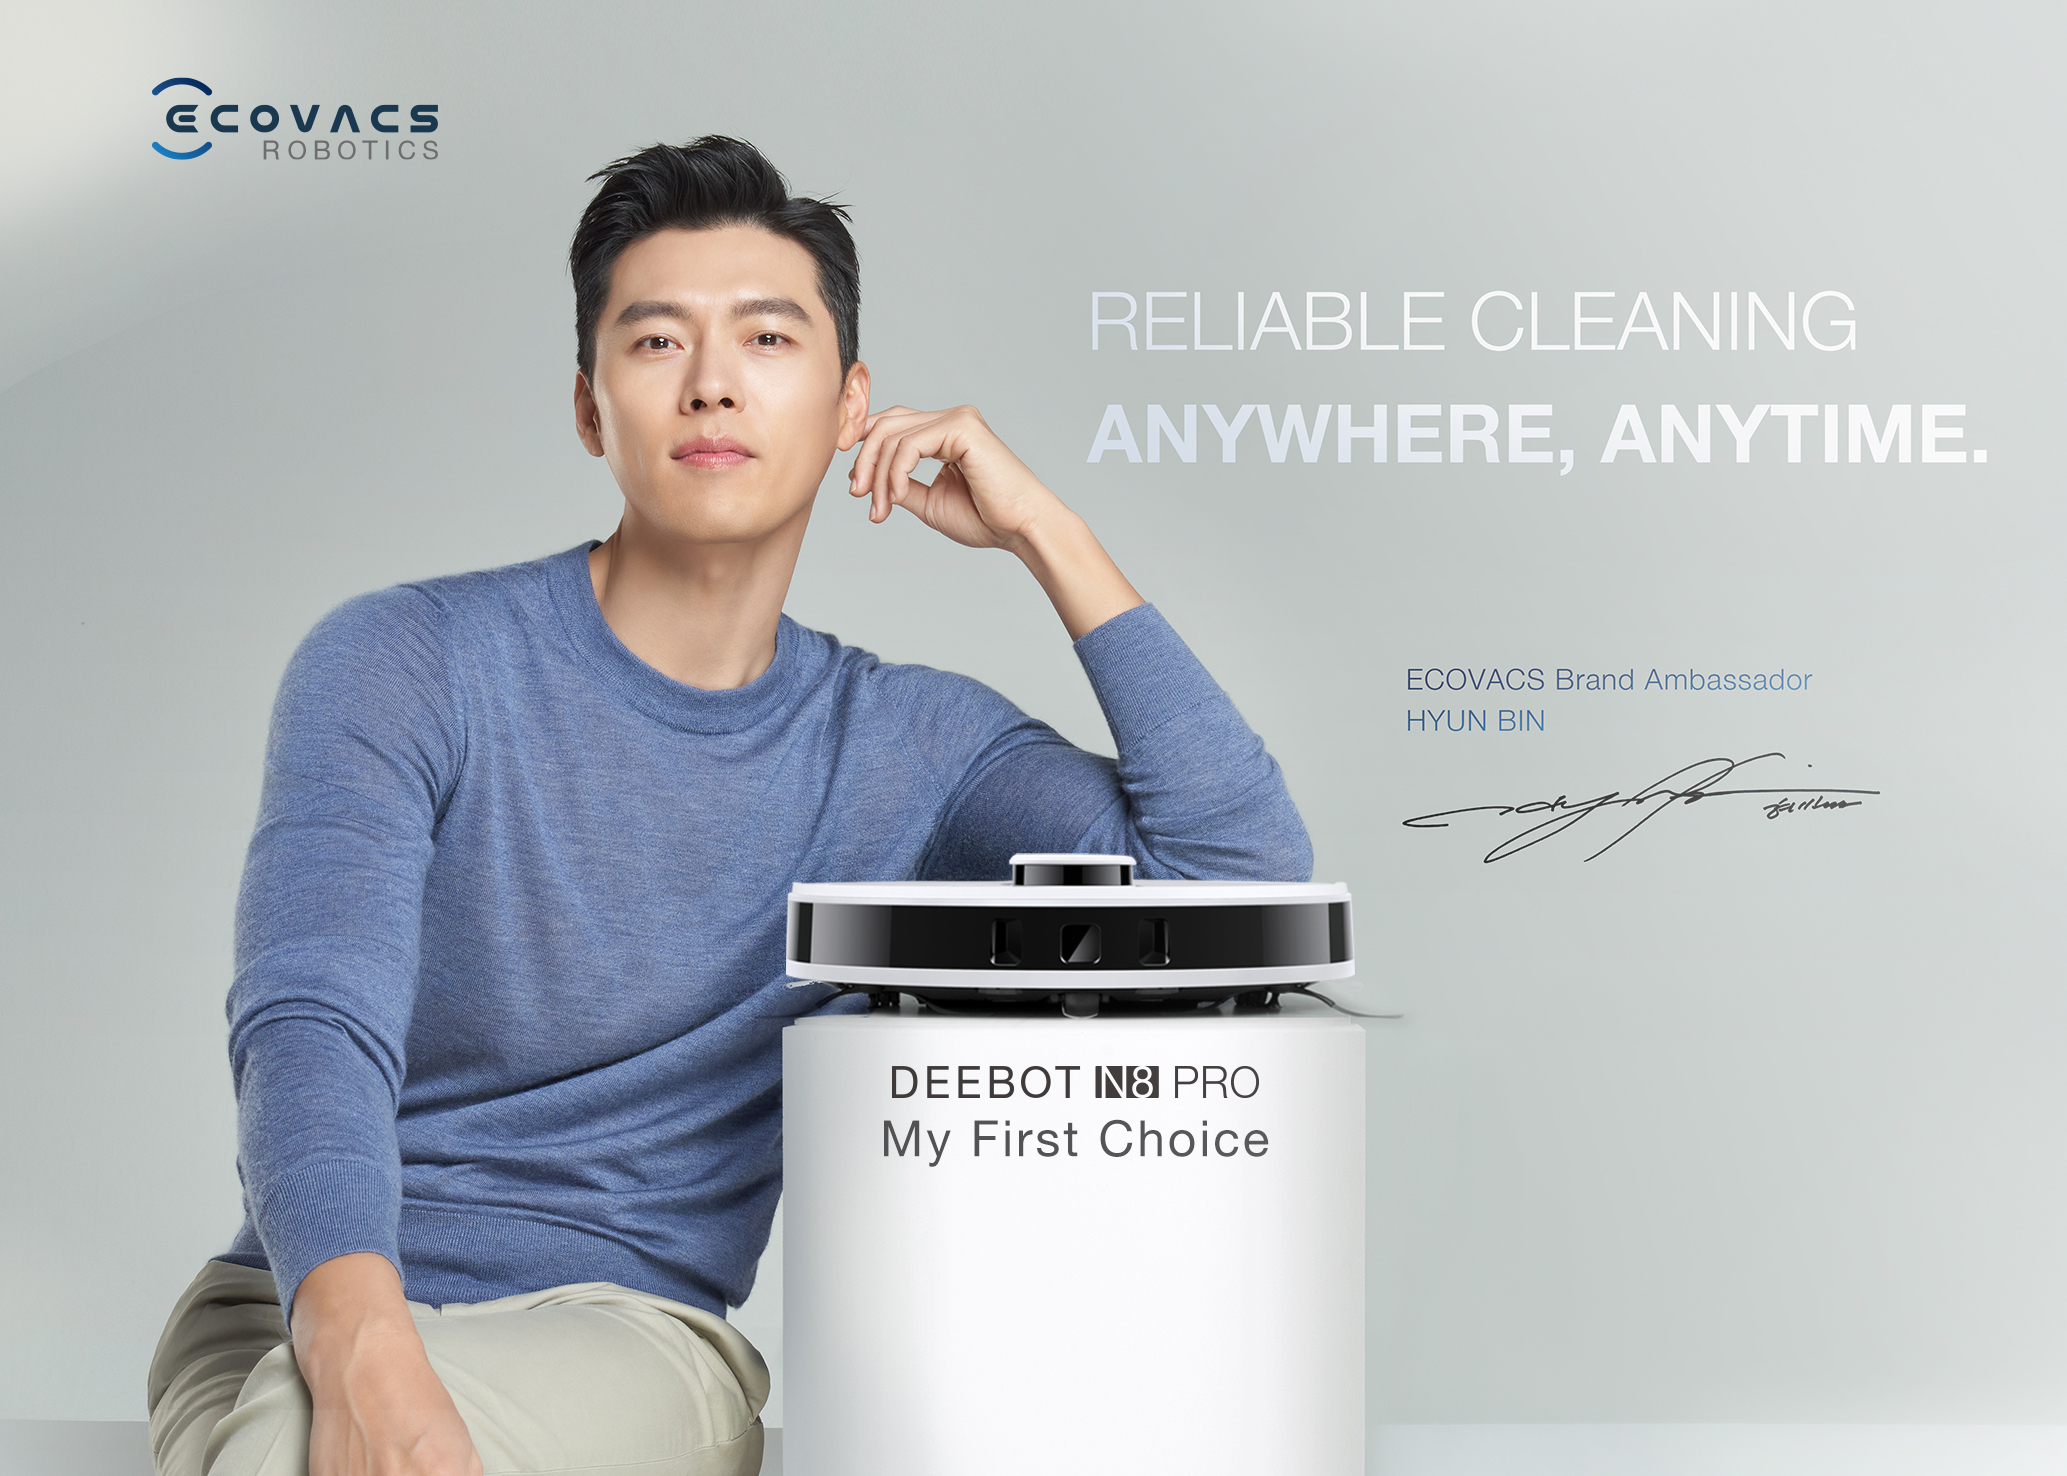 ECOVACS ROBOTICS Appoints Popular Korean Actor Hyun Bin as Brand Ambassador Adding Excitement To Singapore Market